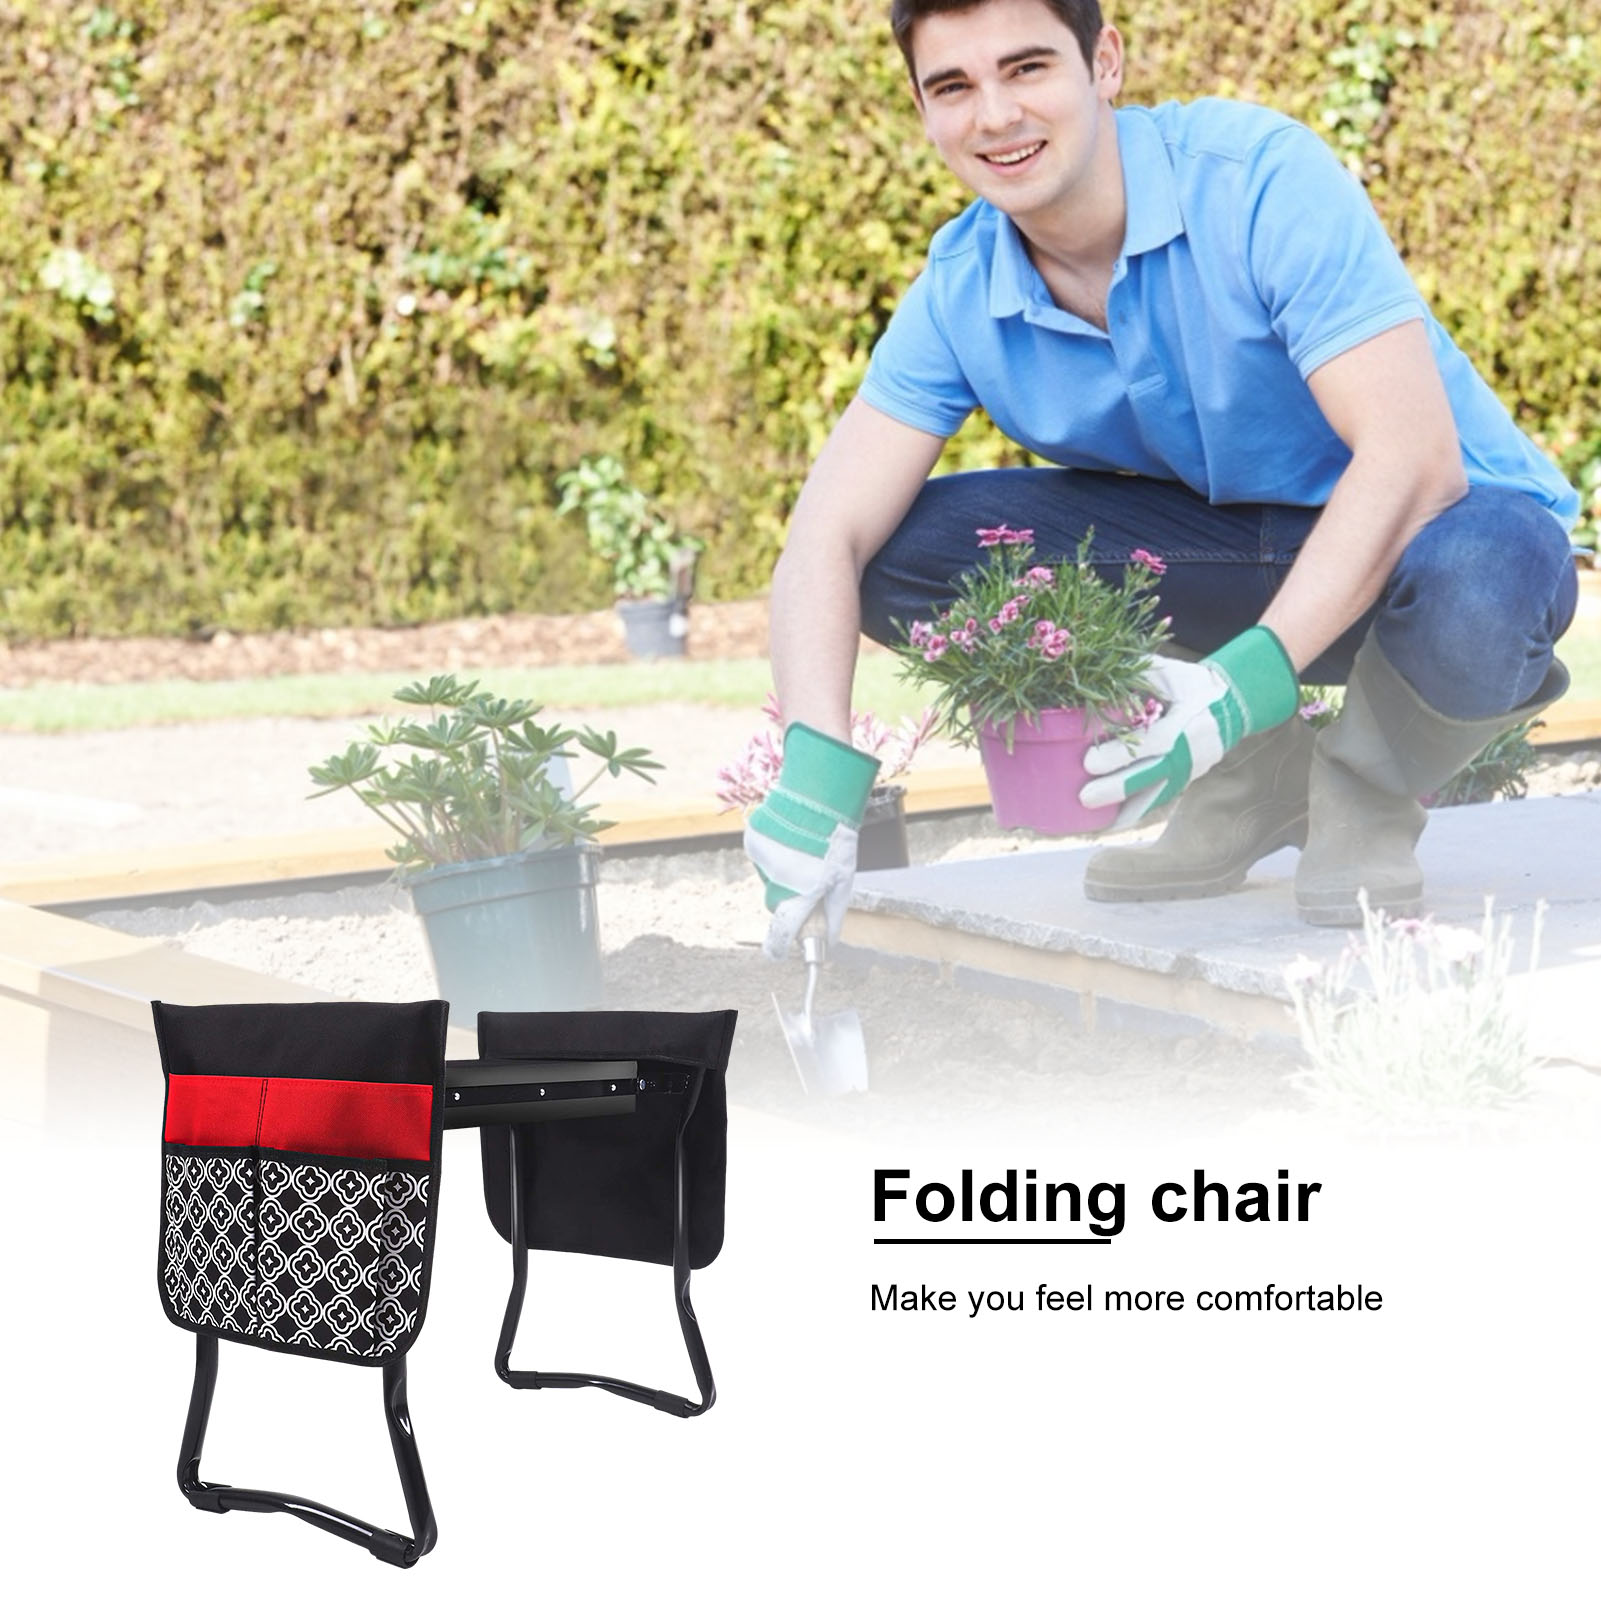 Garden Kneeler And Seat Folding Stainless Steel Garden Stool With Side Pocket Garden Kneeling Mat Gardening Gifts Supply